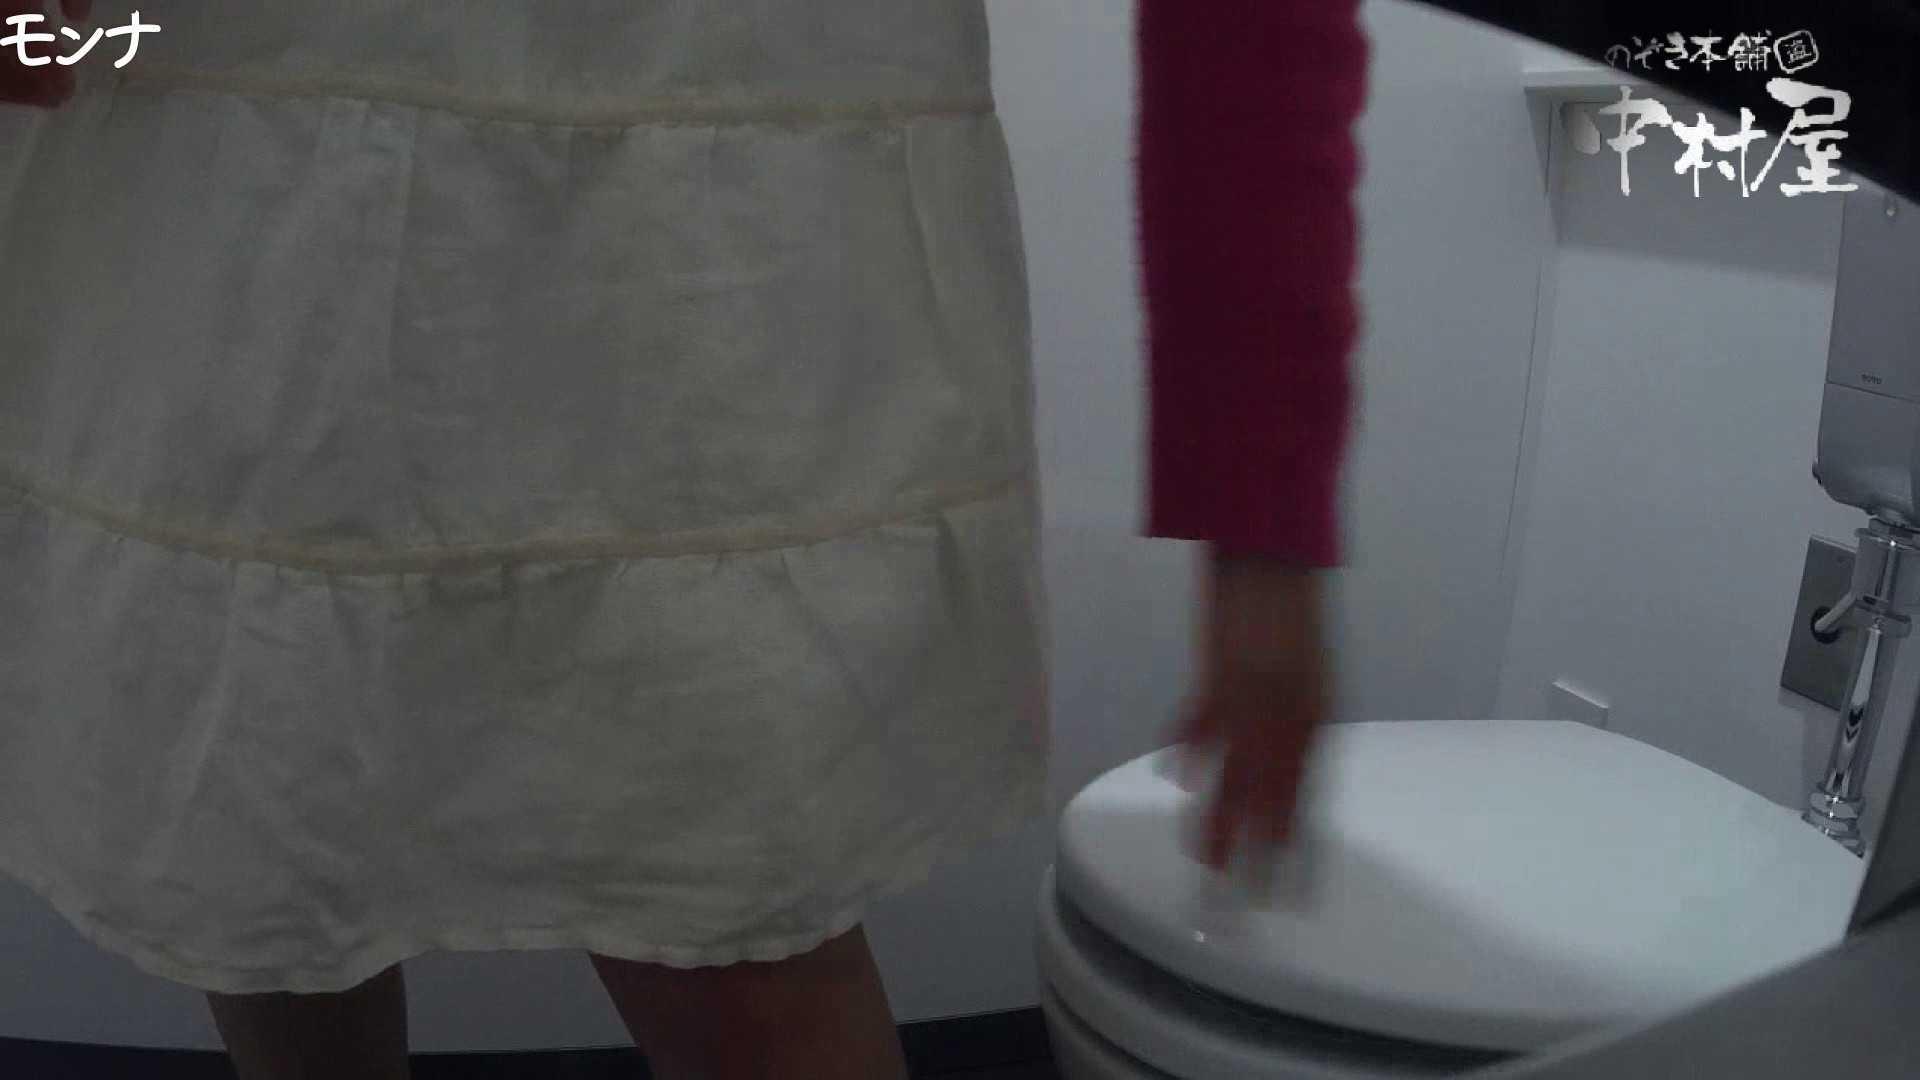 有名大学女性洗面所 vol.65 秘技!!マルチアングル天井撮り!! 洗面所編 性交動画流出 106PIX 83